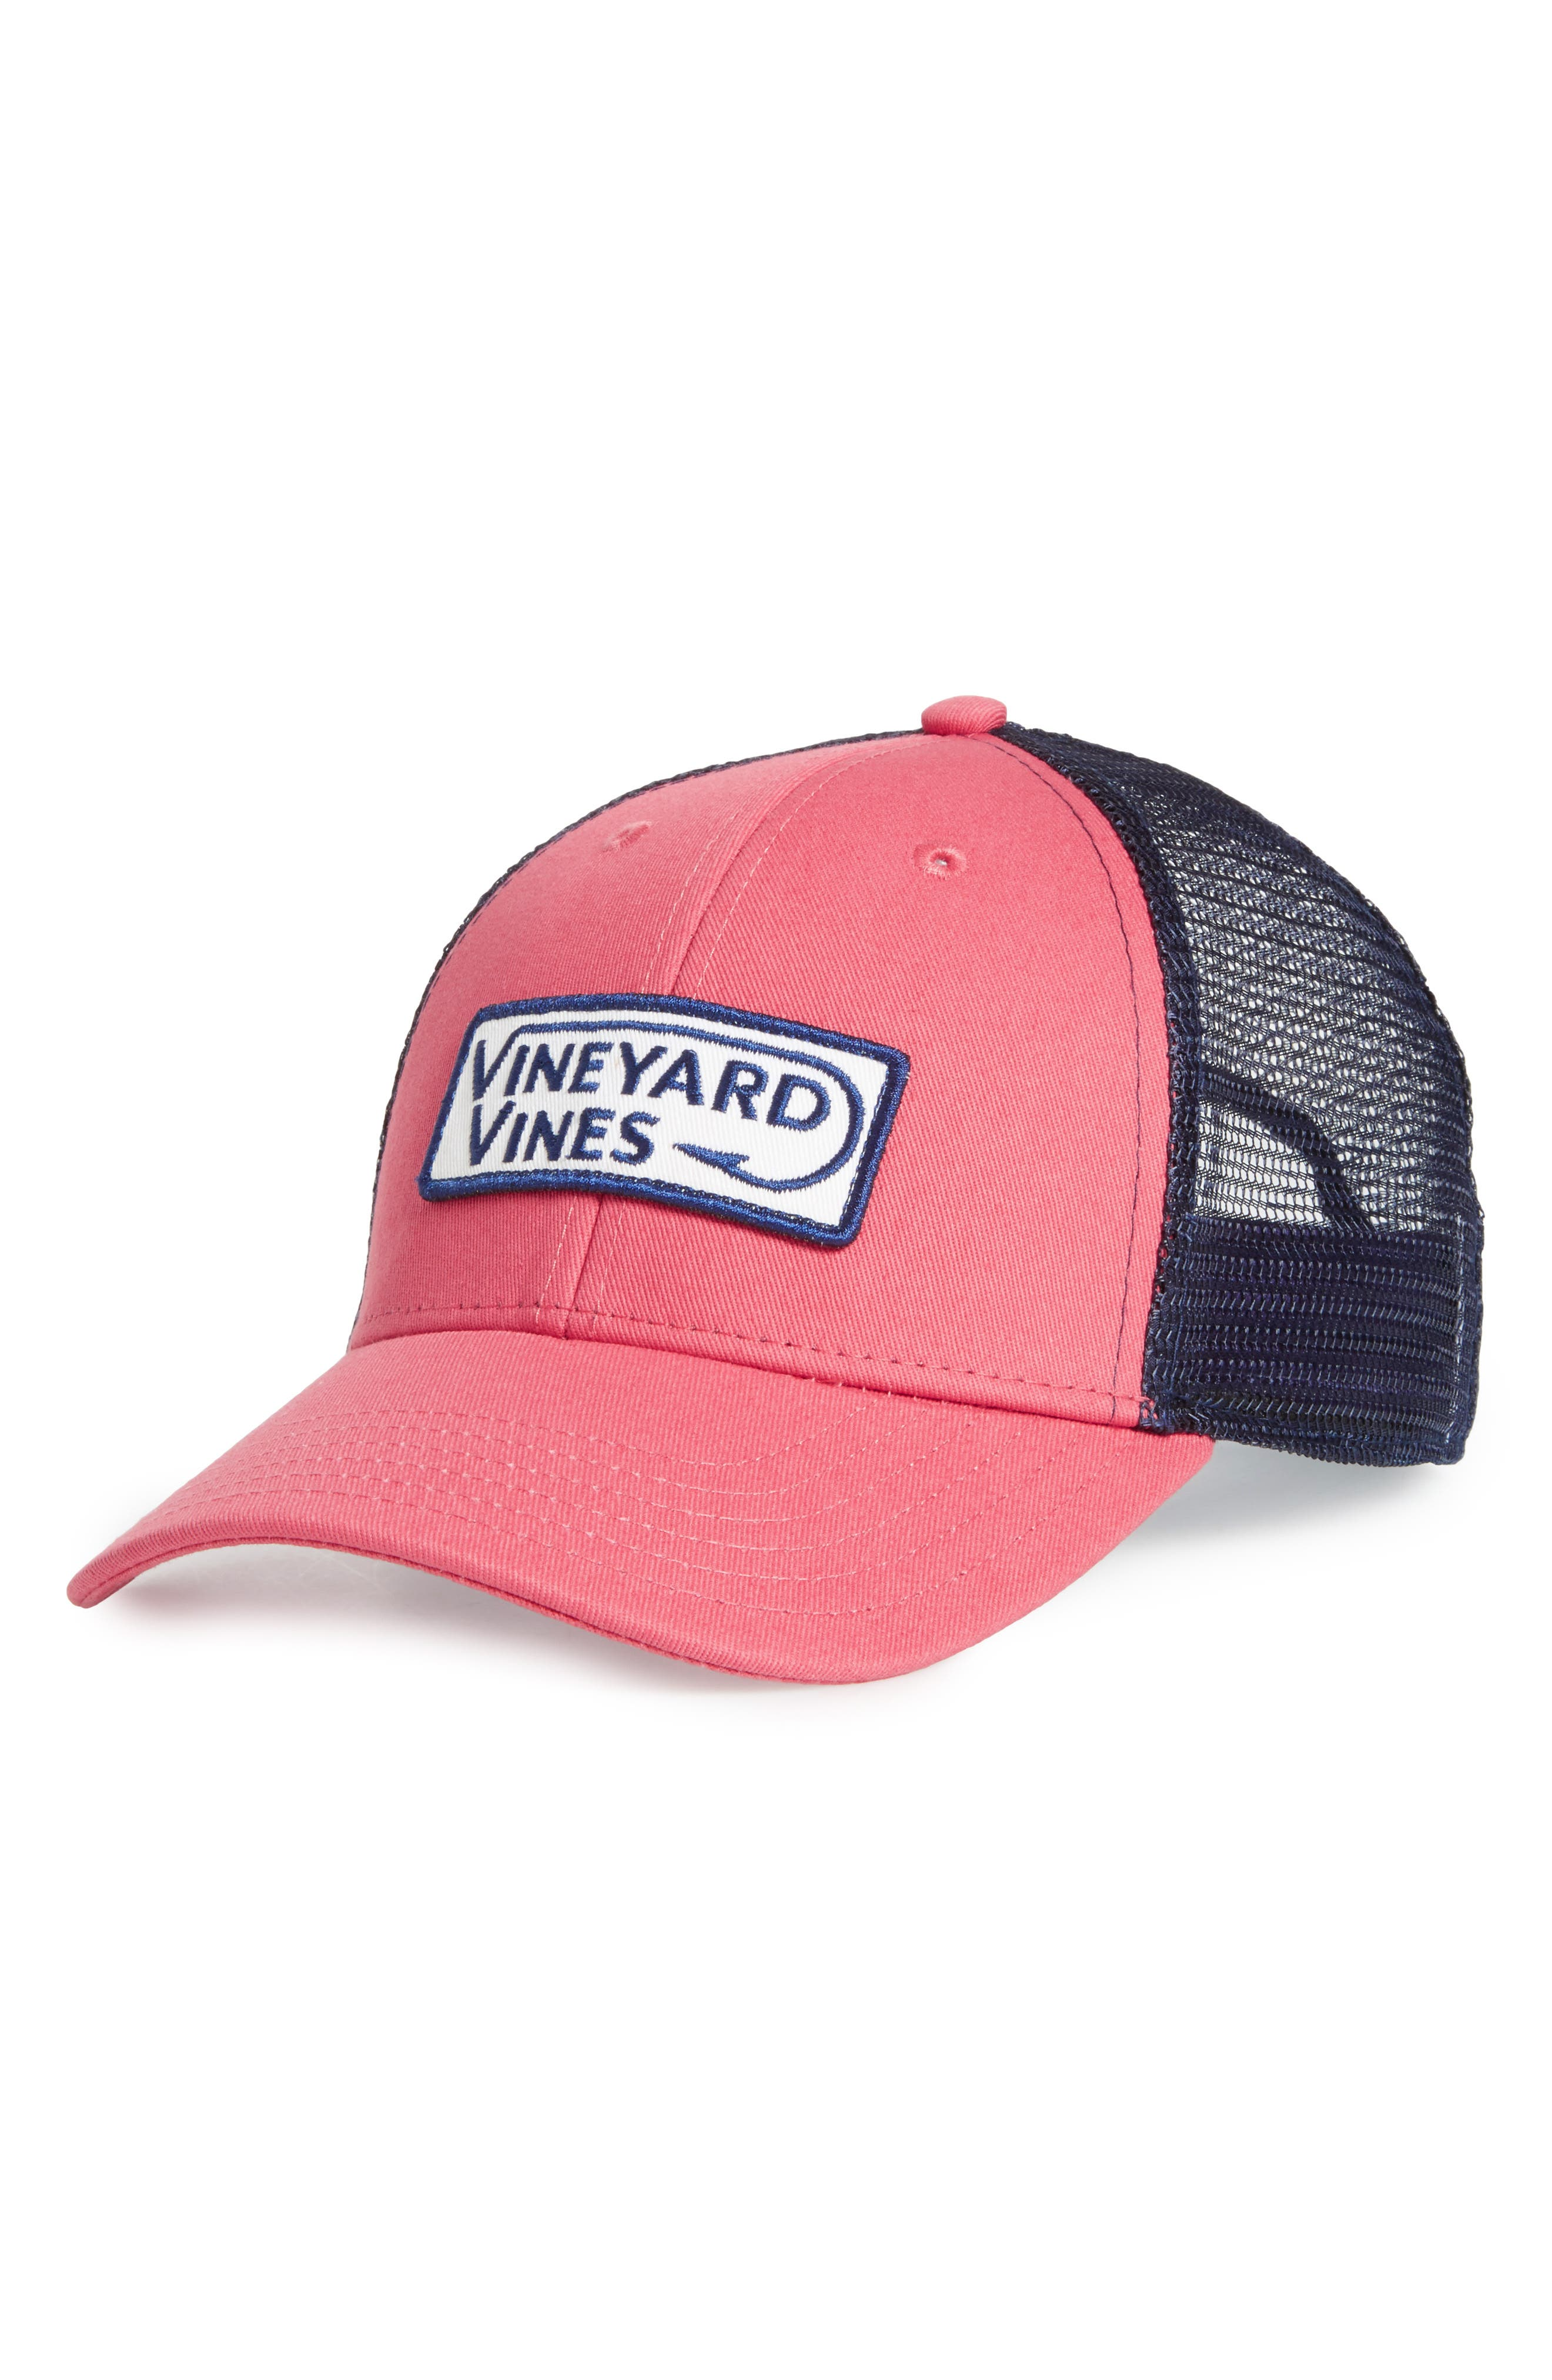 Main Image - vineyard vines Hook Patch Trucker Cap